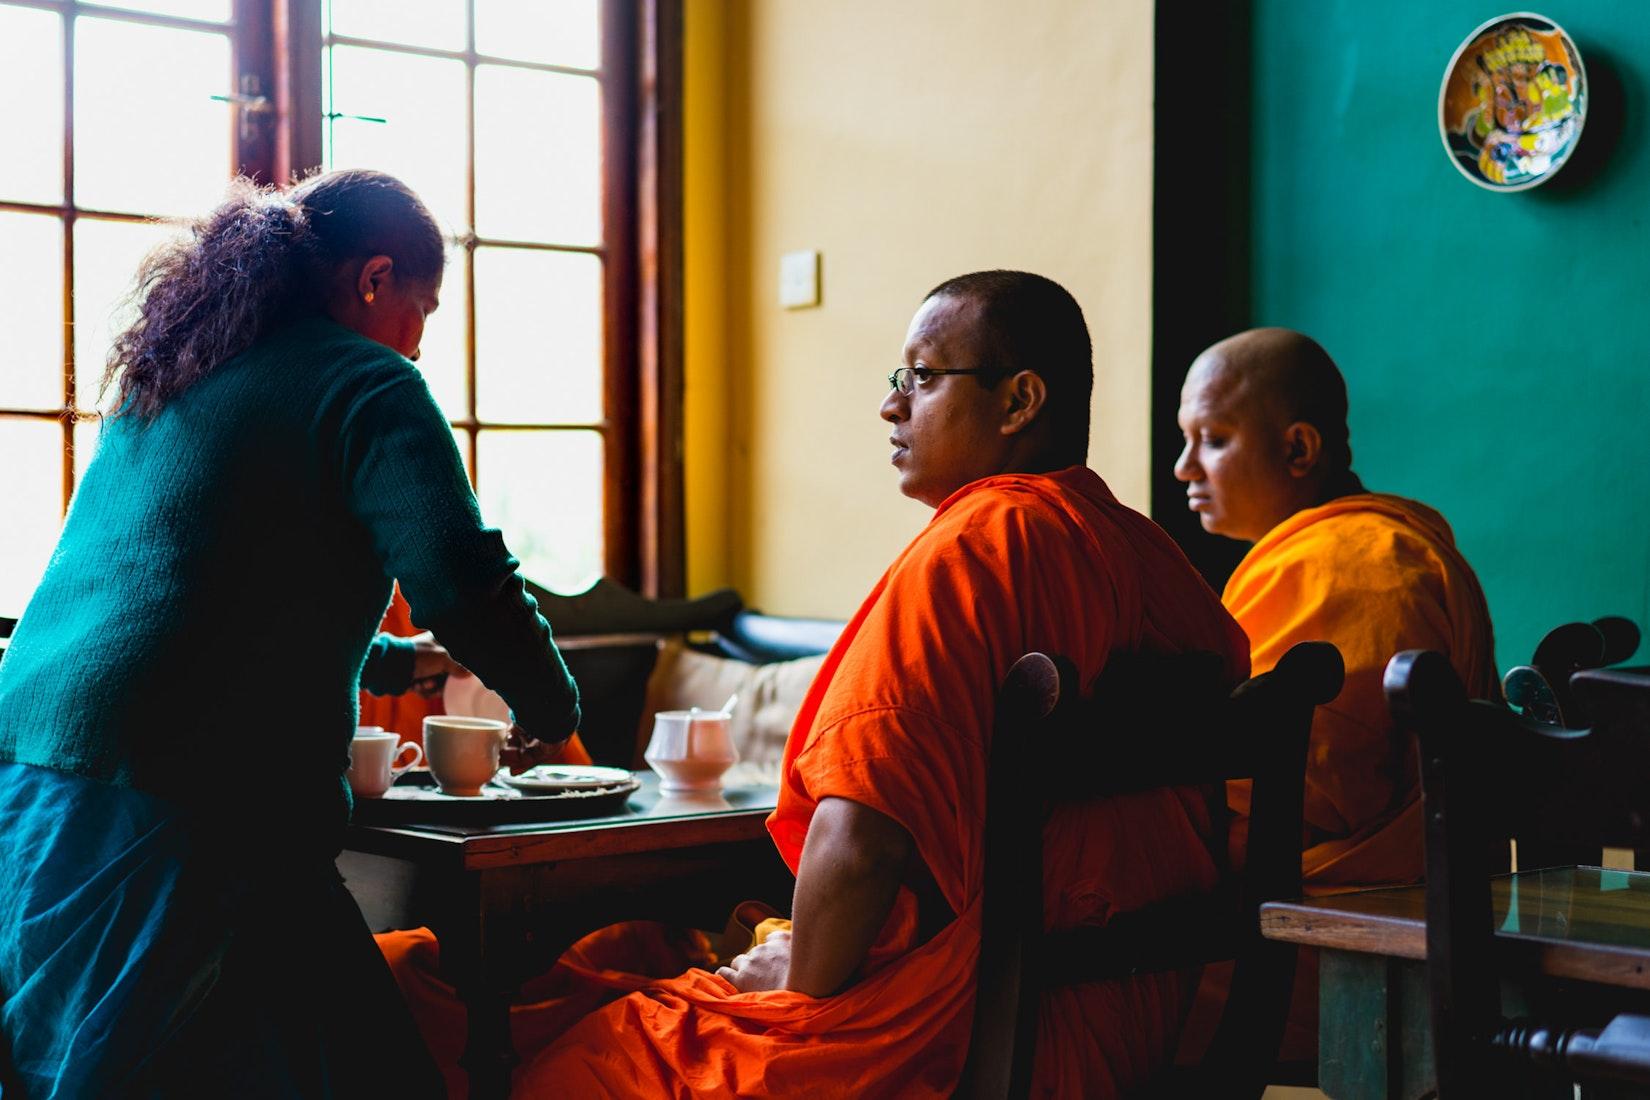 Monks being served tea